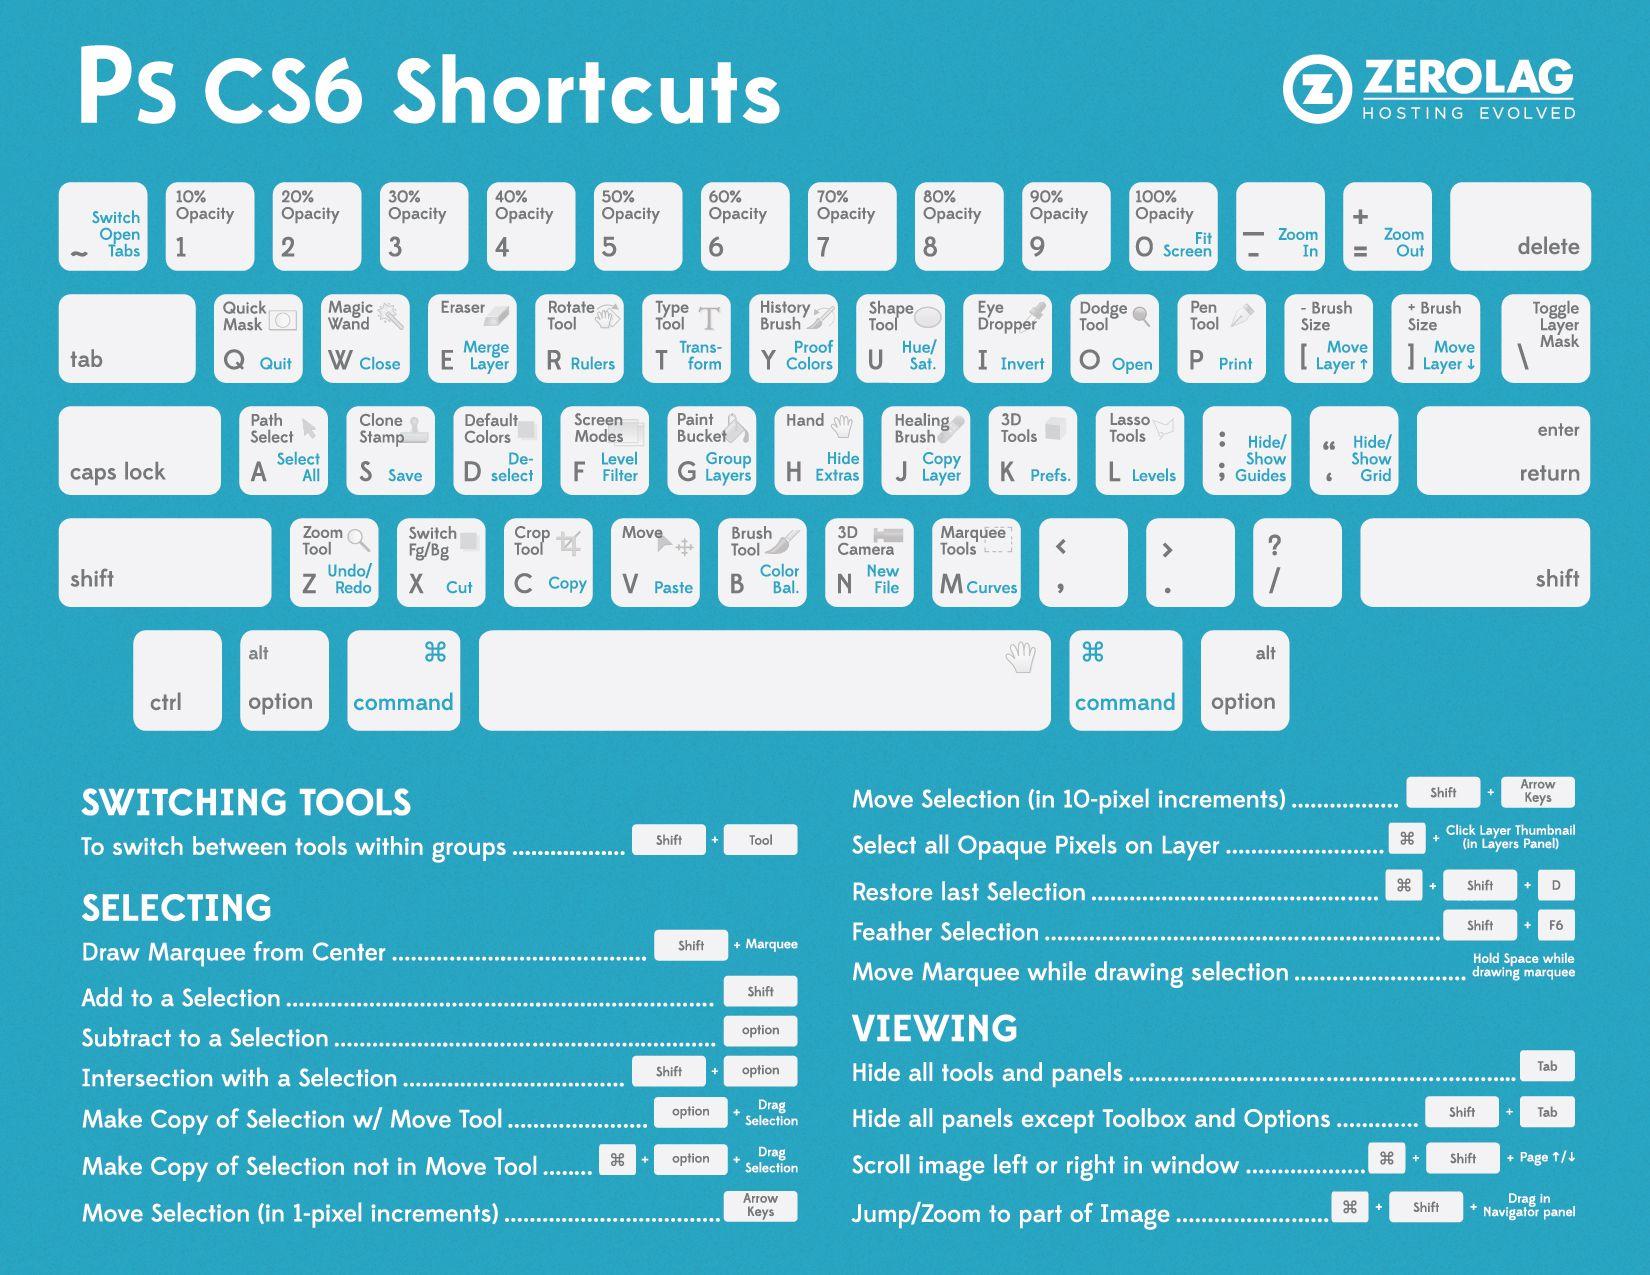 Adobe Photoshop CS6 shortcuts cheat sheet #ThursdayTips - Tiragraffi Magazine